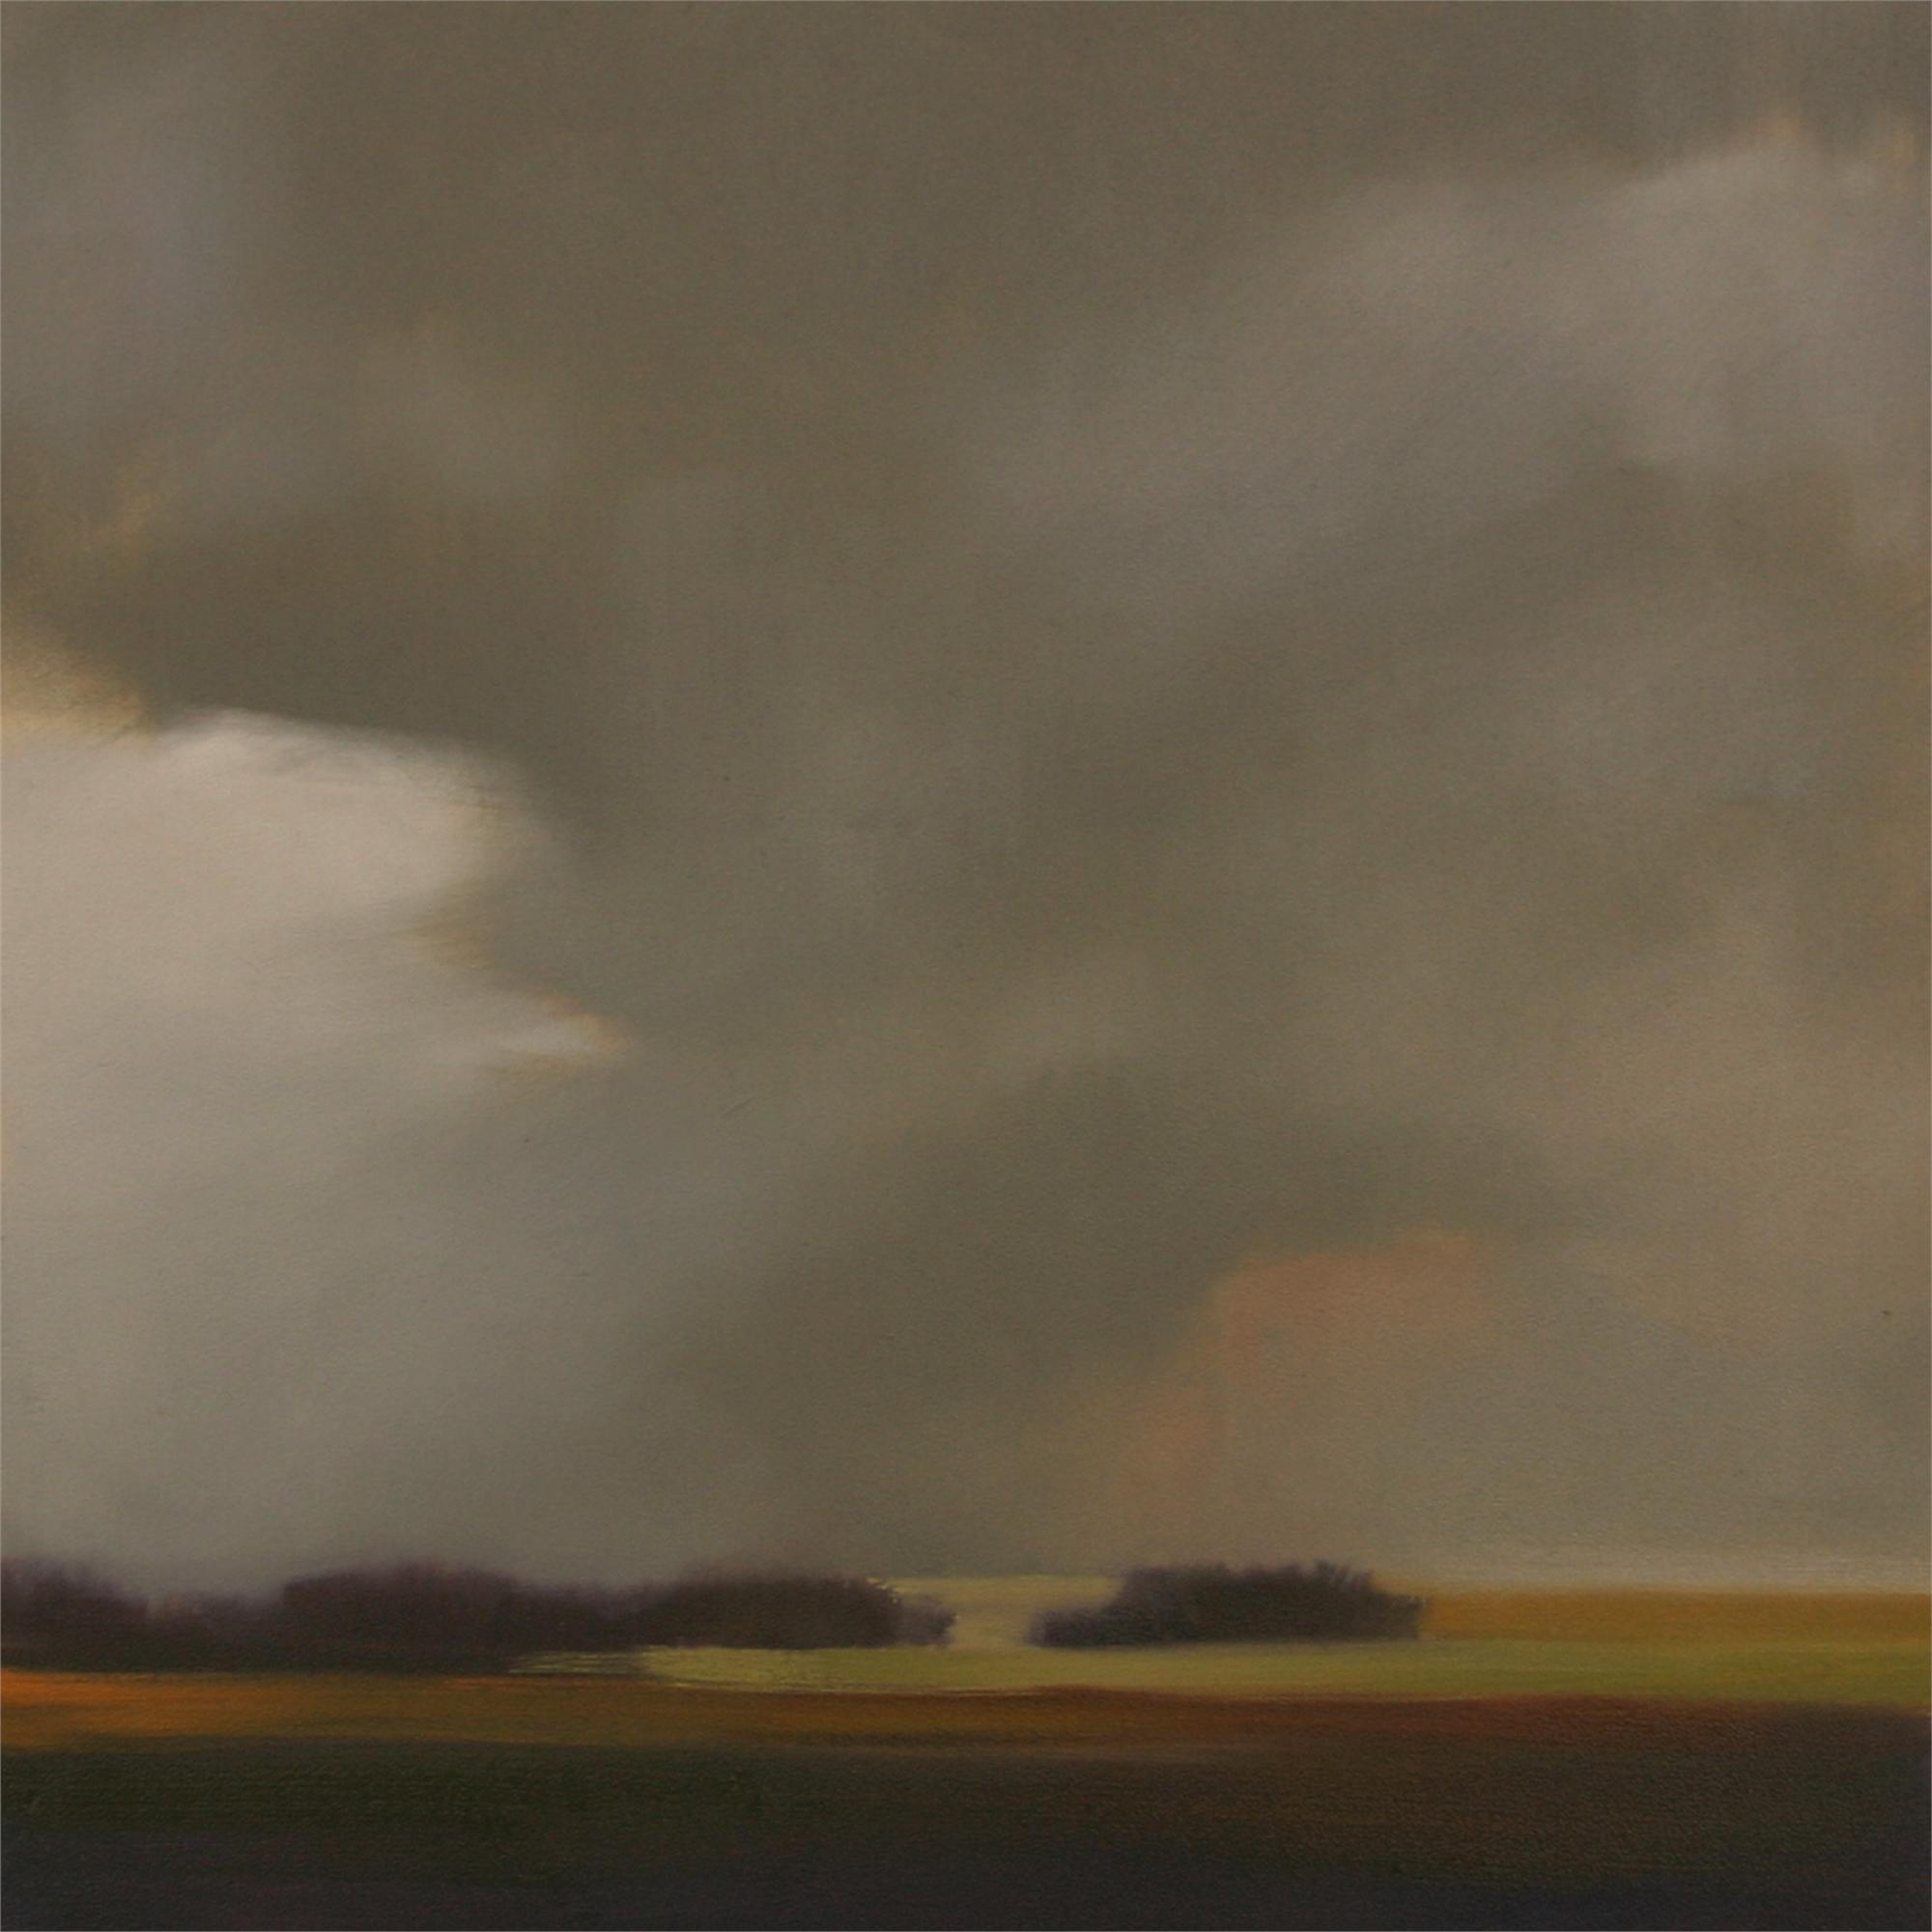 Moving Storm Study by Megan Lightell